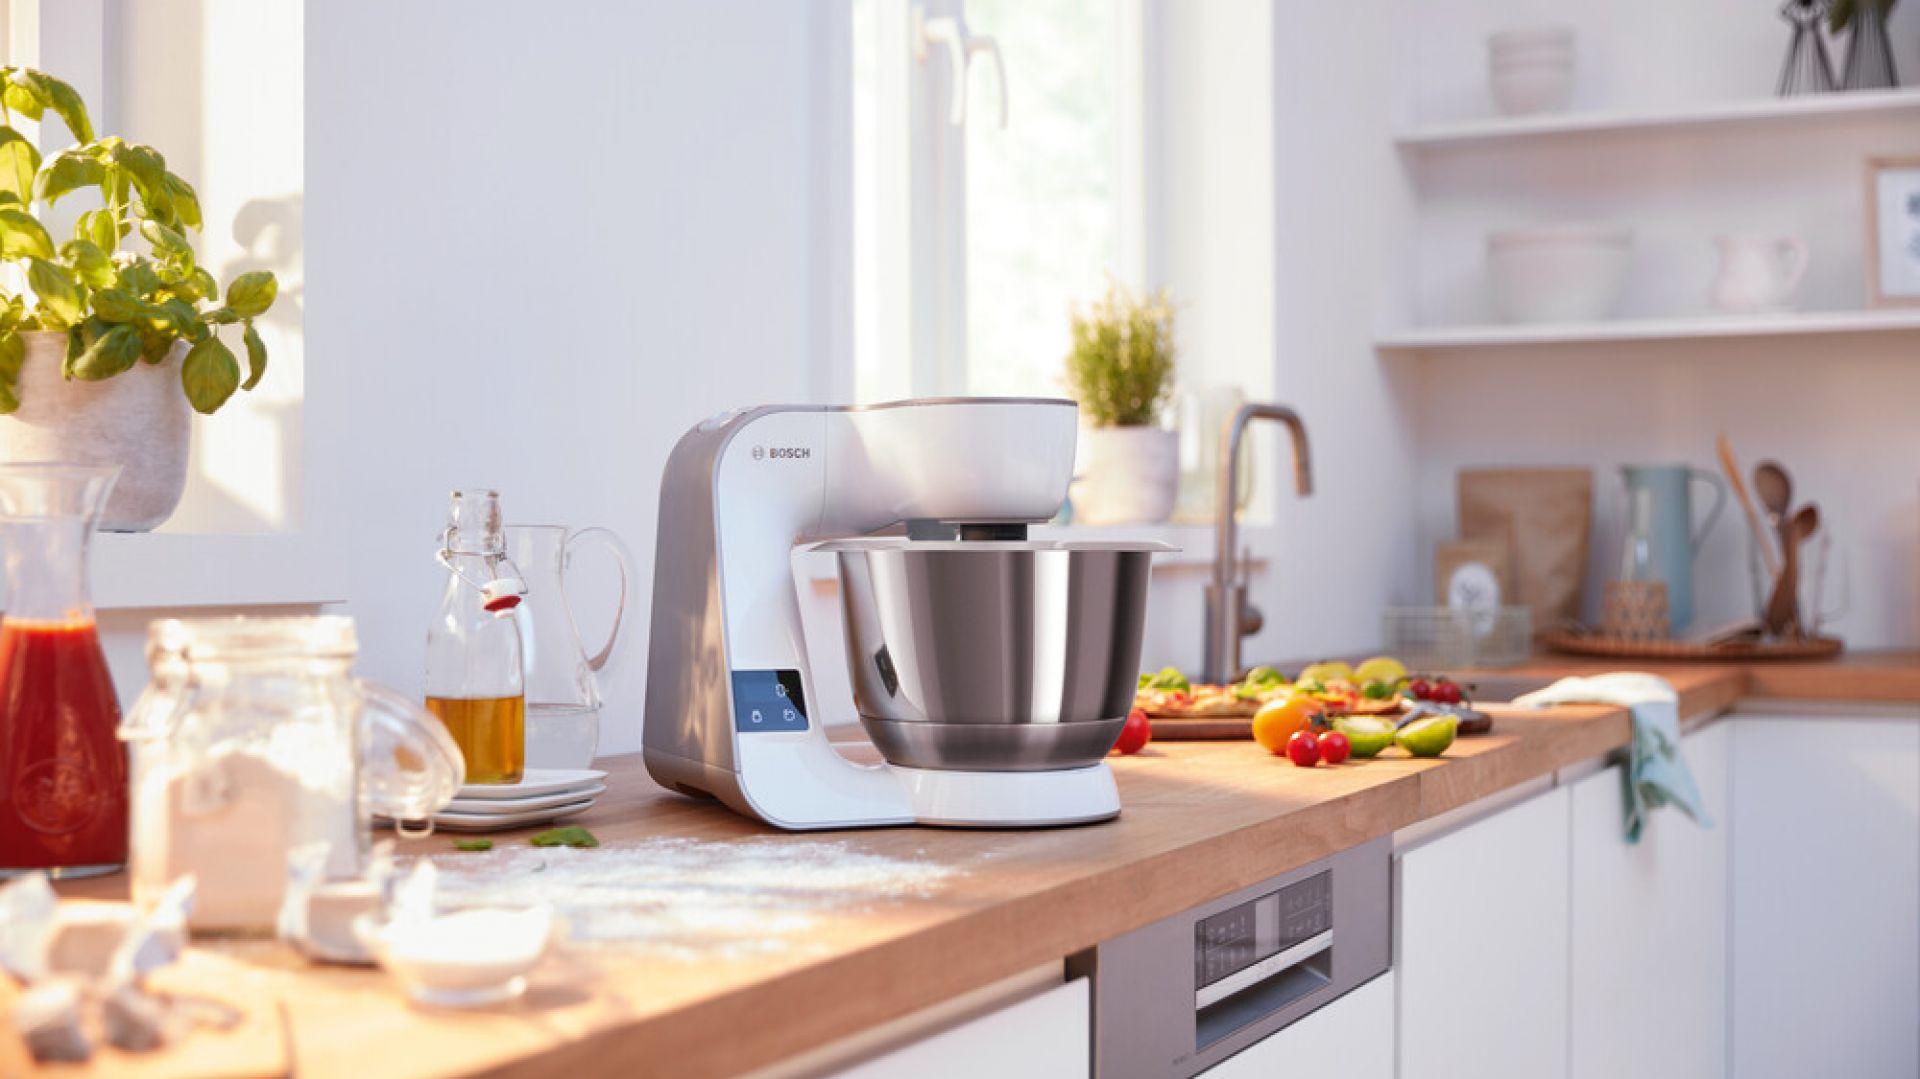 Bosch Kuhinjski aparat, 1000 W, MUM5XW40